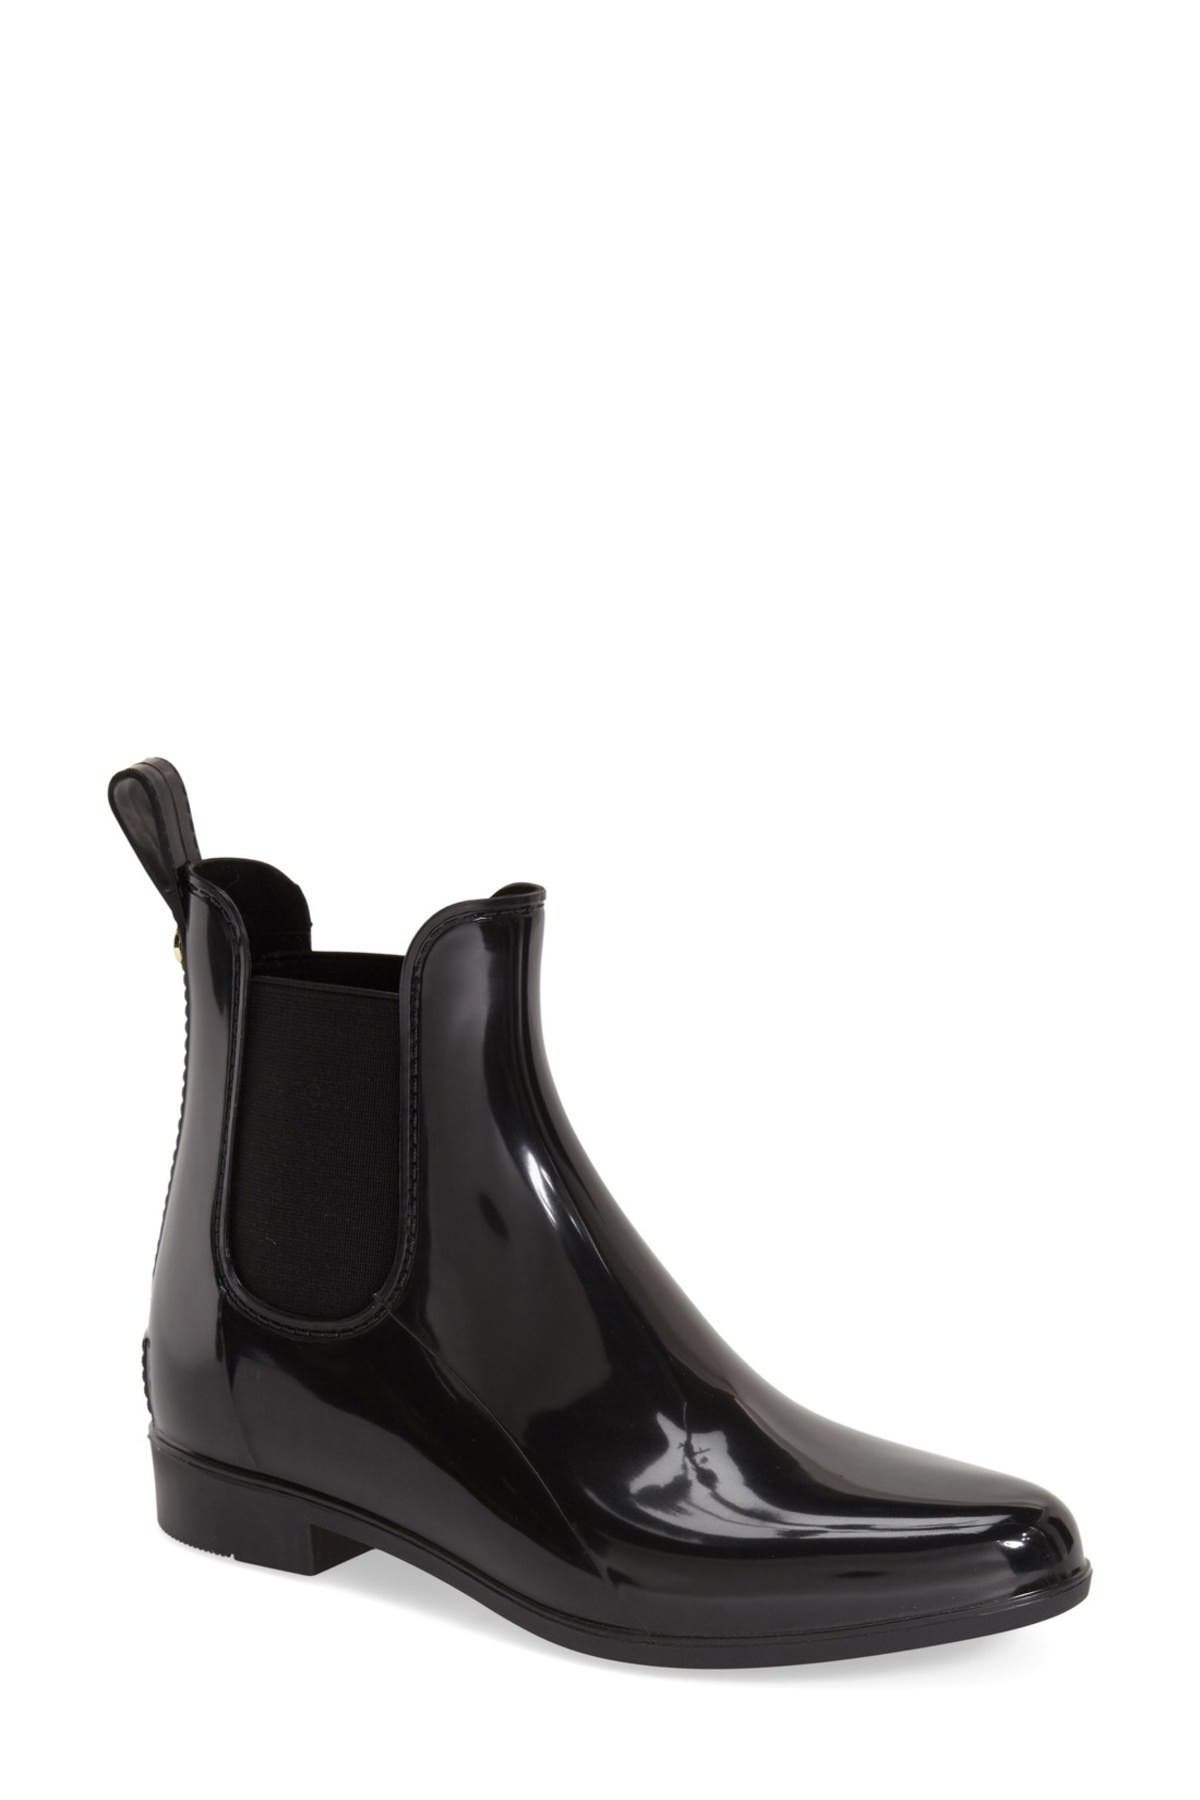 Sam Edelman | Tinsley Ankle Rain Boot